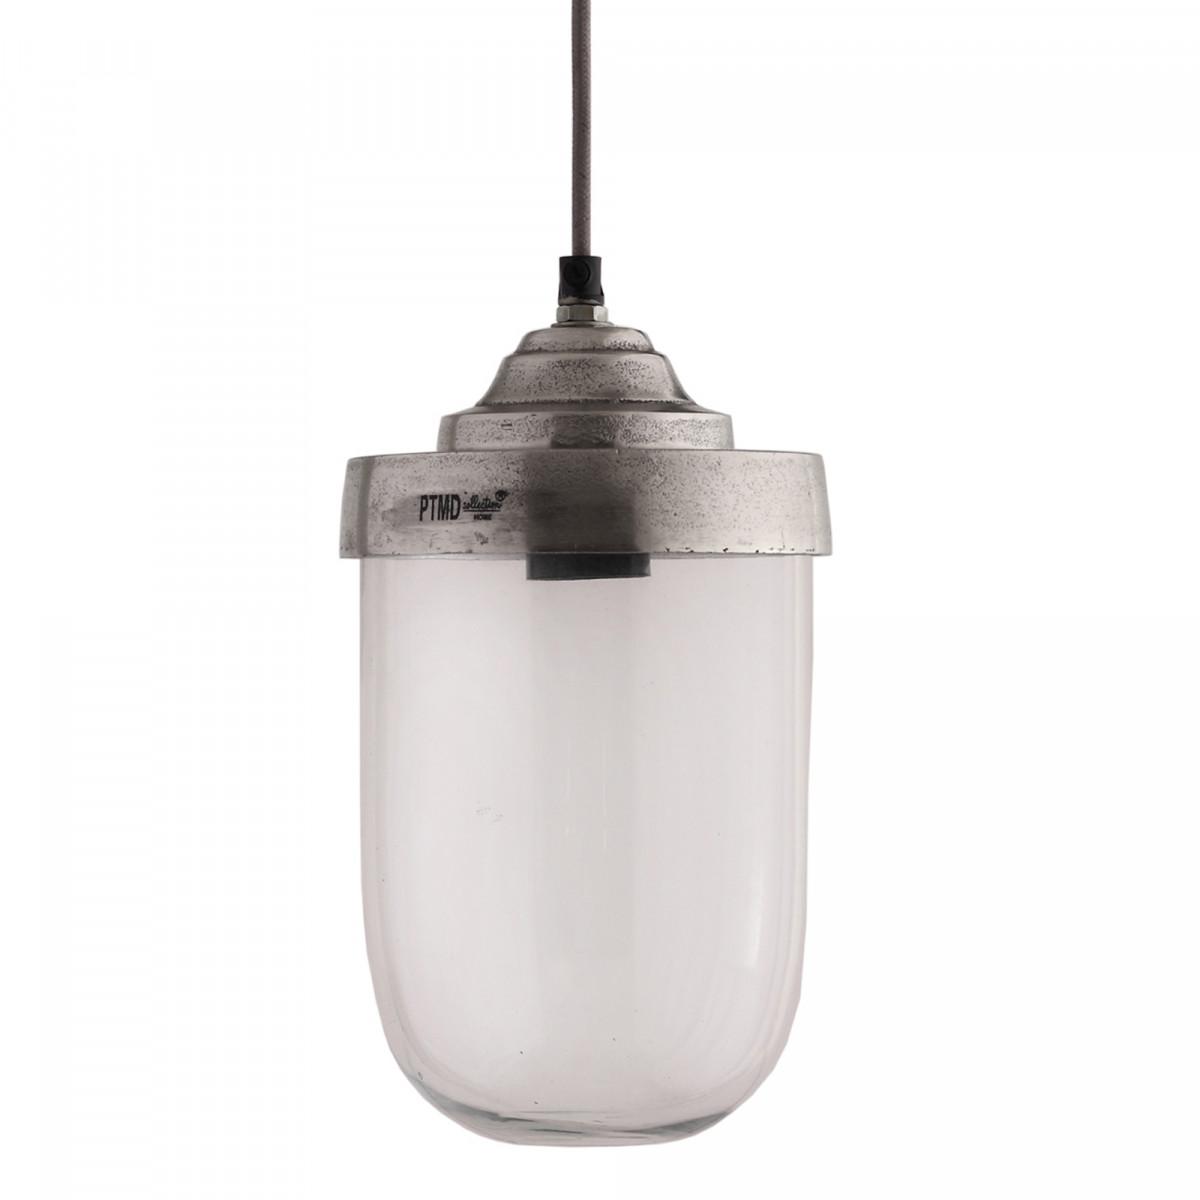 PTMD Tucson S metaal hanglamp (673350)